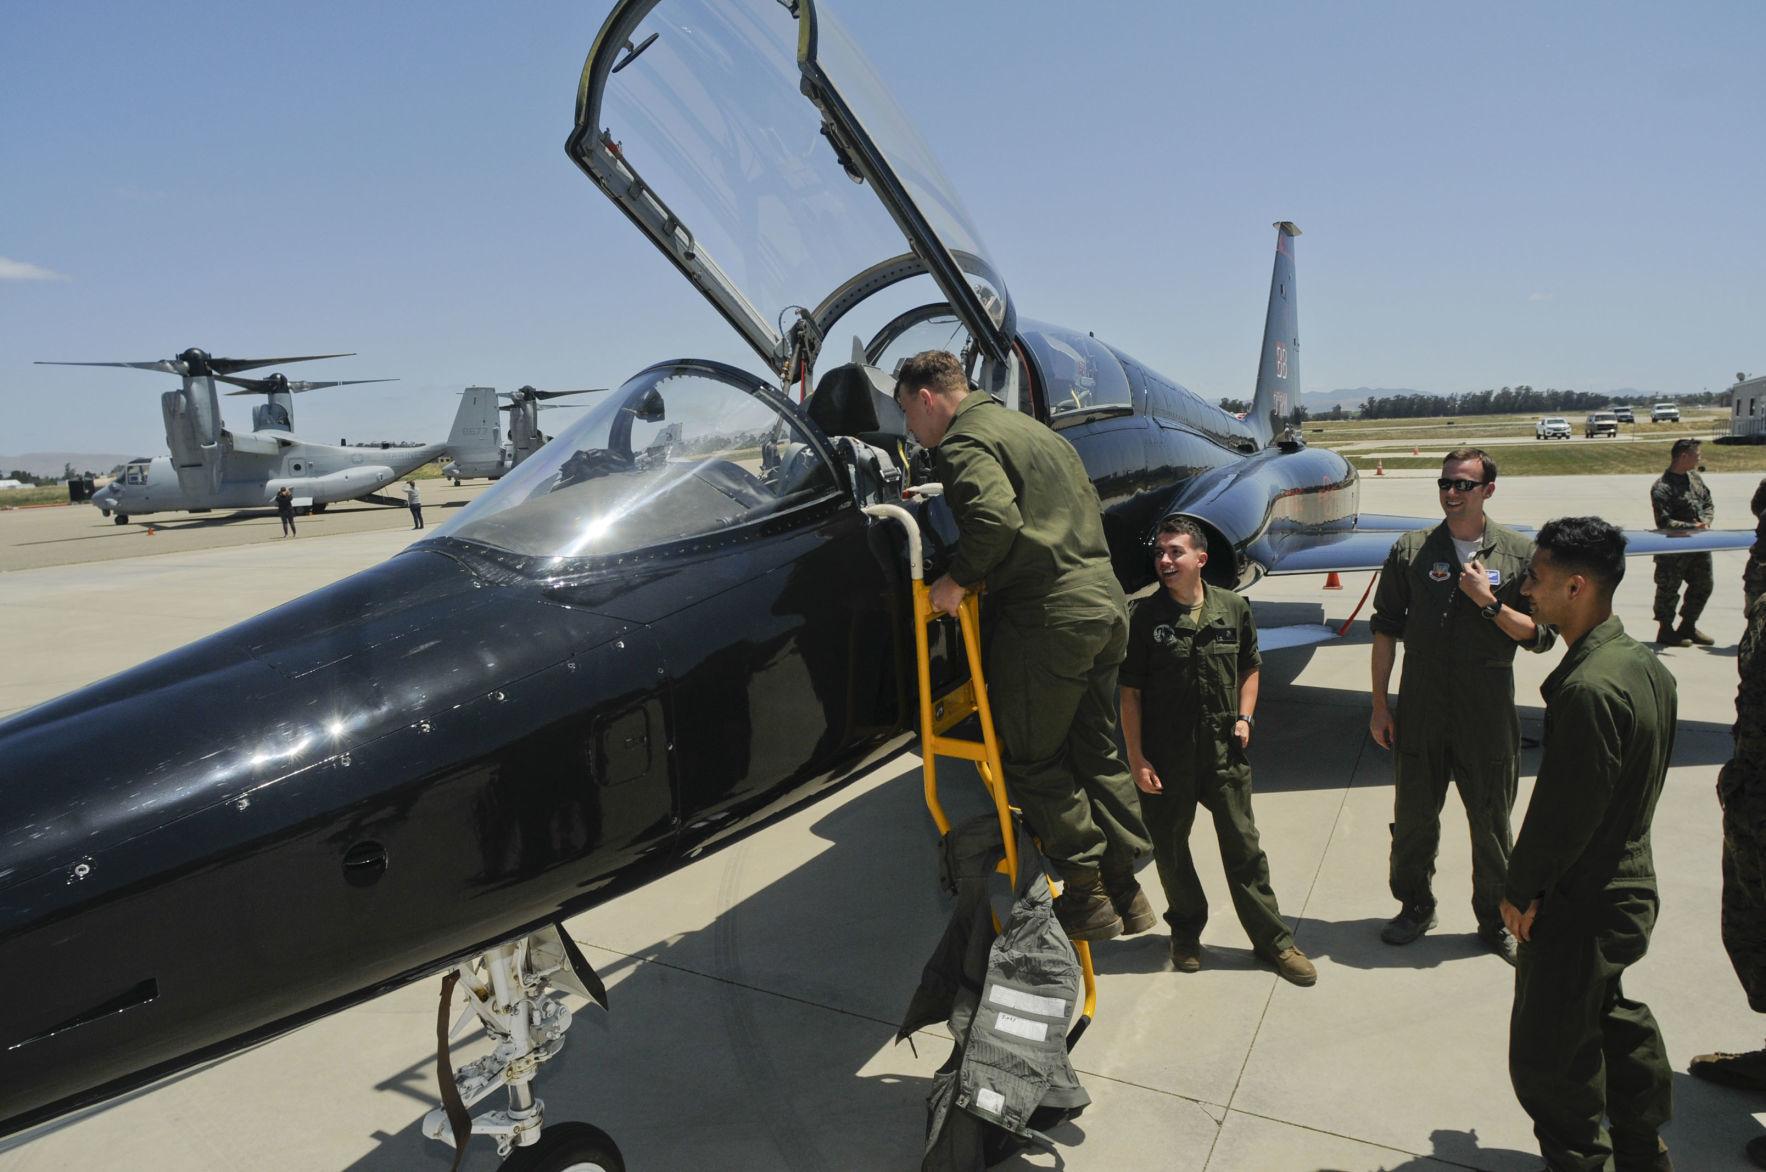 ROYAL AIR FORCE DREM  BASE BEER STEIN